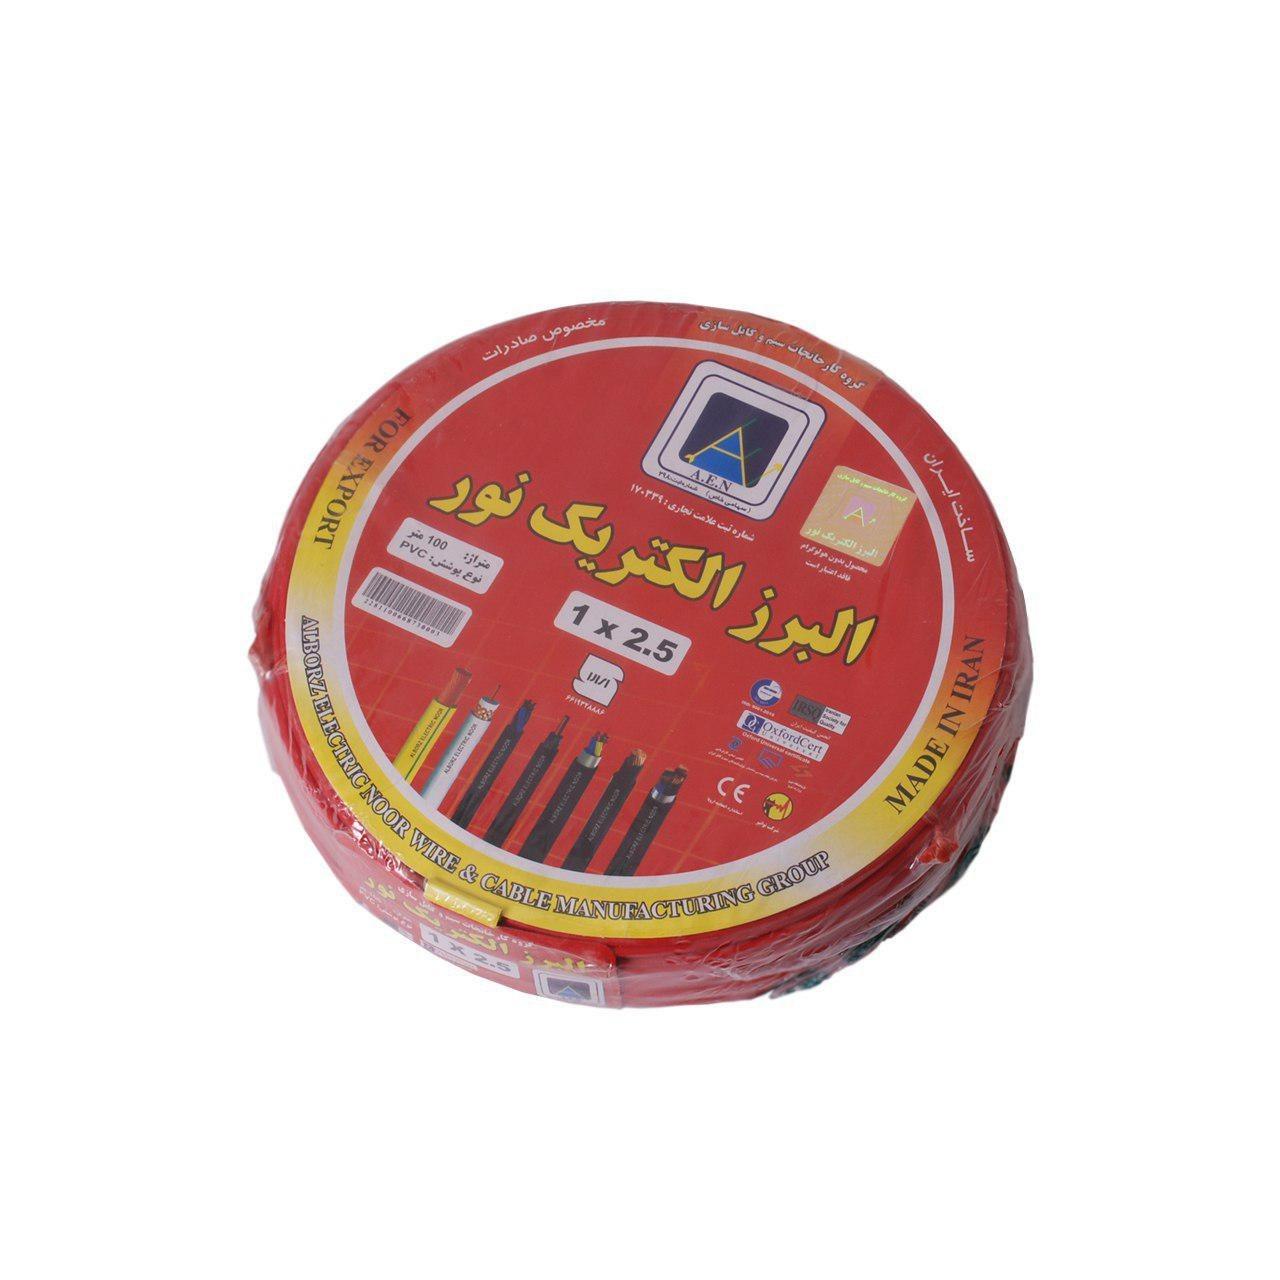 main images سیم برق افشان 1 در 2.5 البرز الکترونیک نور مدل 125